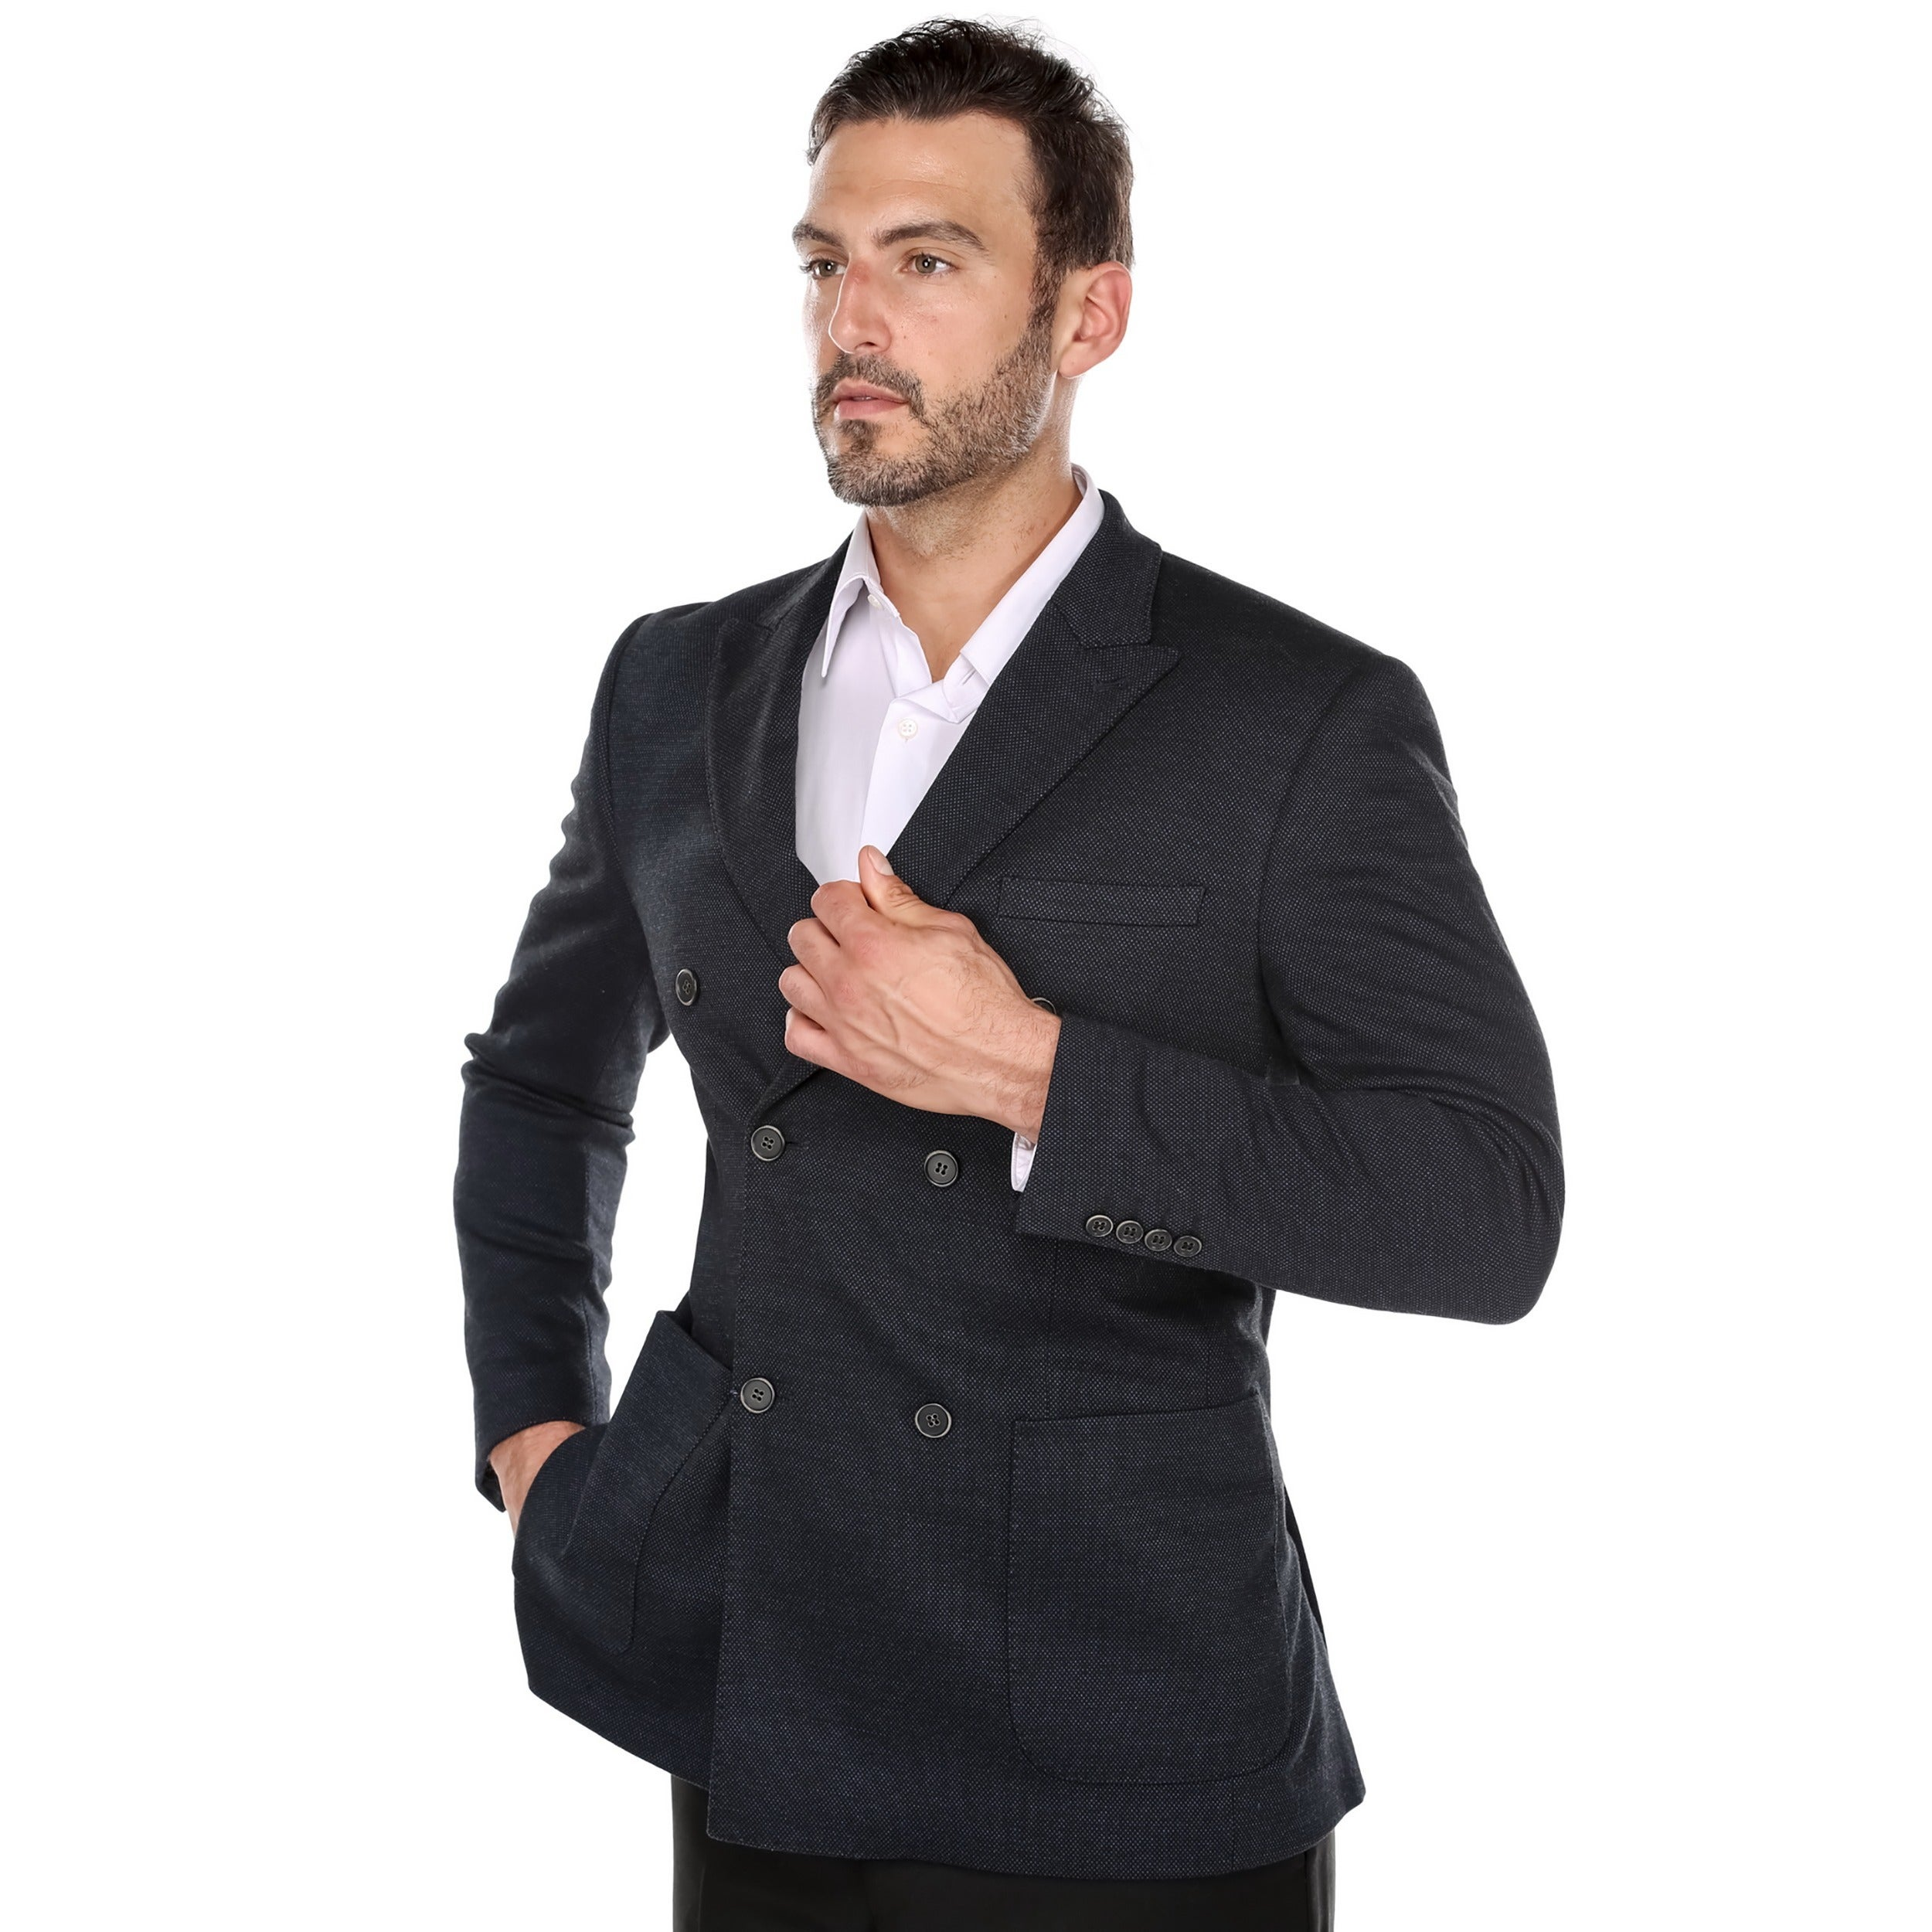 Mens Patterned Blazers Magnificent Design Inspiration